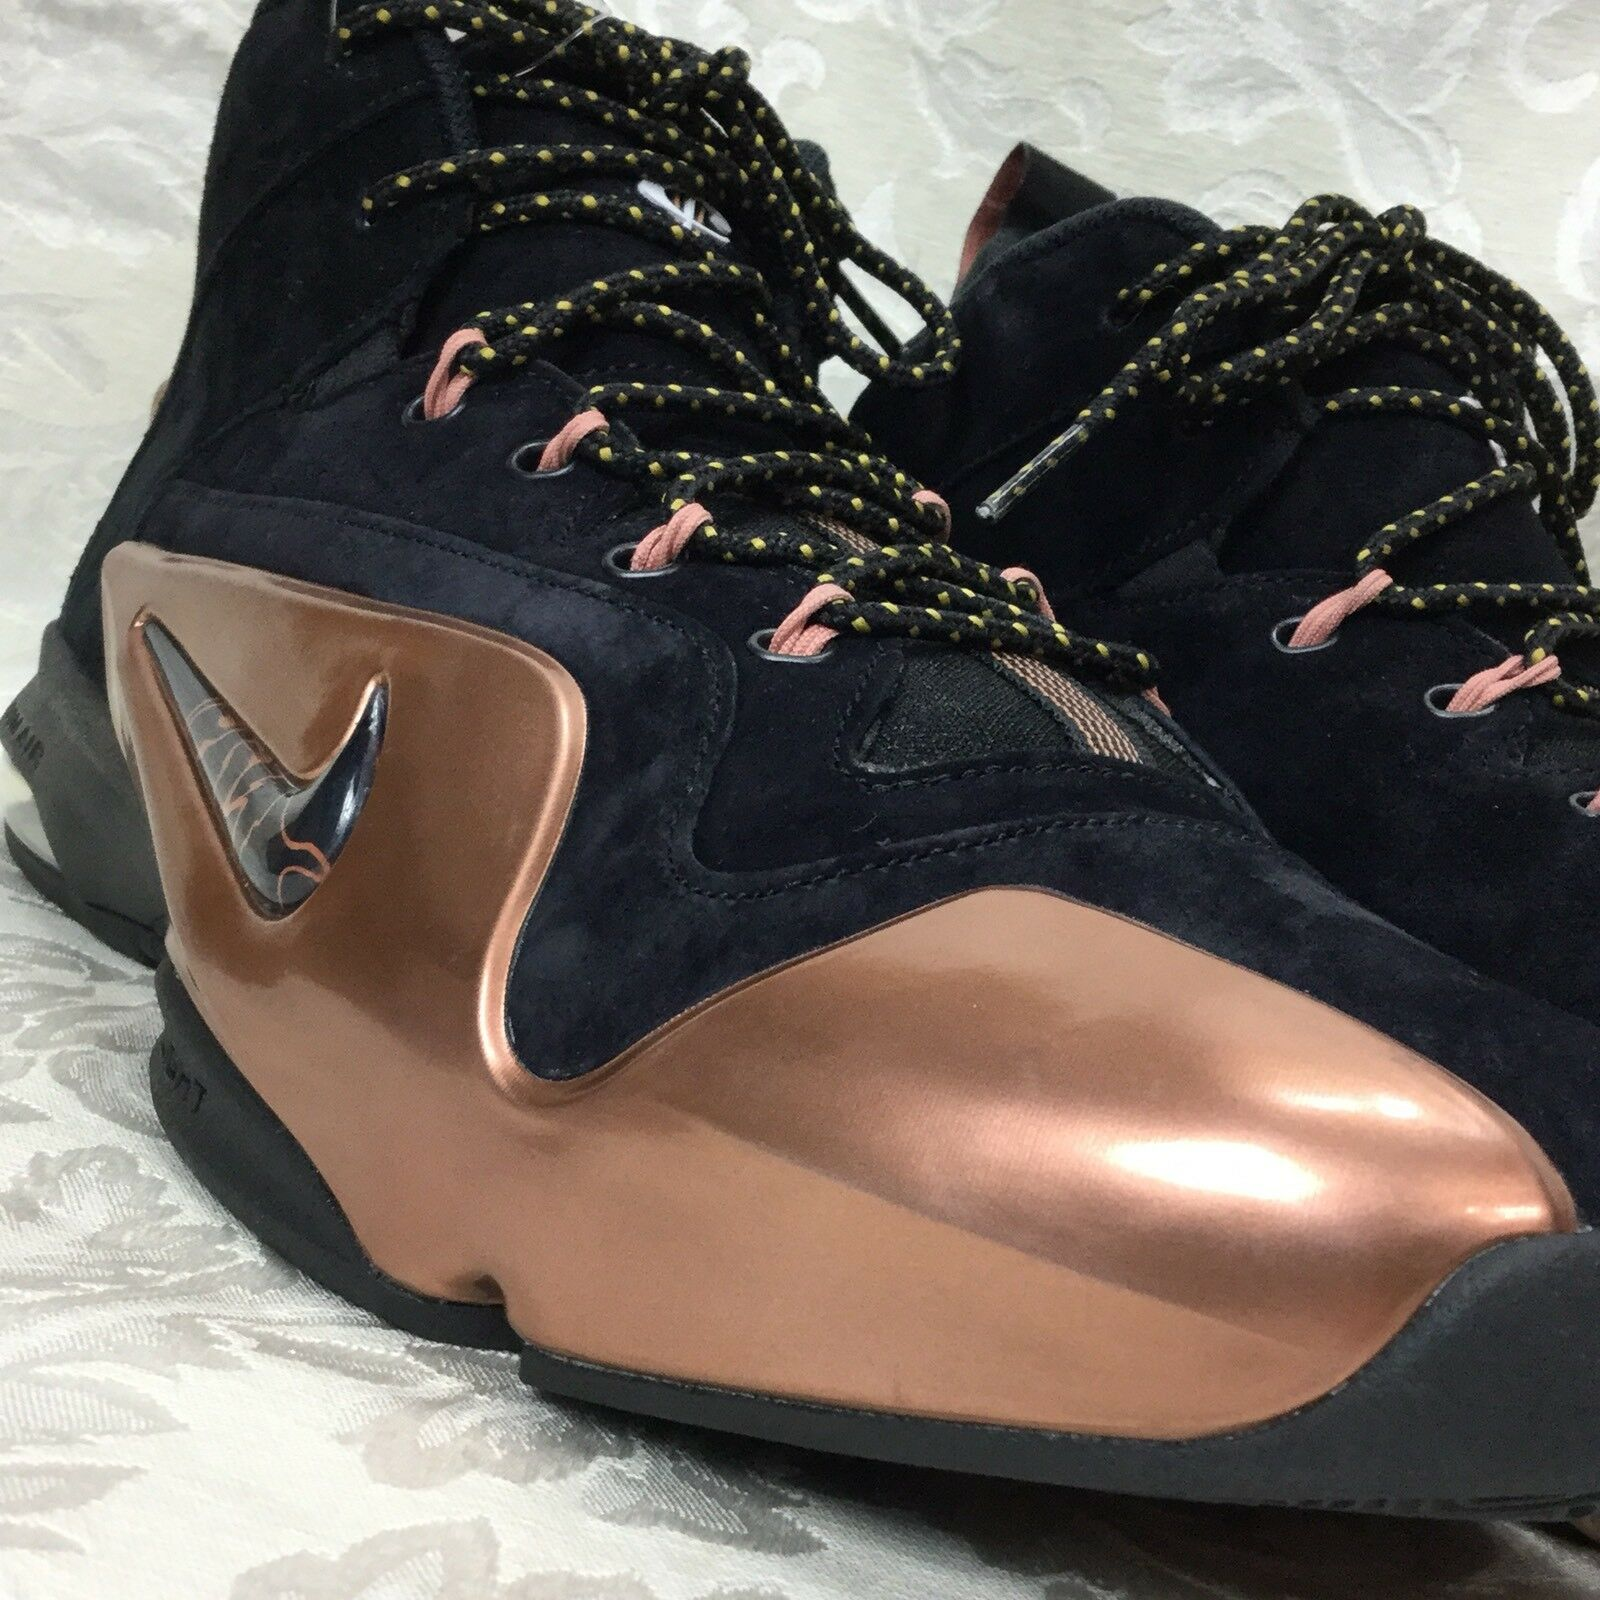 NIKE ZOOM AIR PENNY VI 6 PREMIUM PRM Black Metallic Copper 749629 001 mens 11 Wild casual shoes